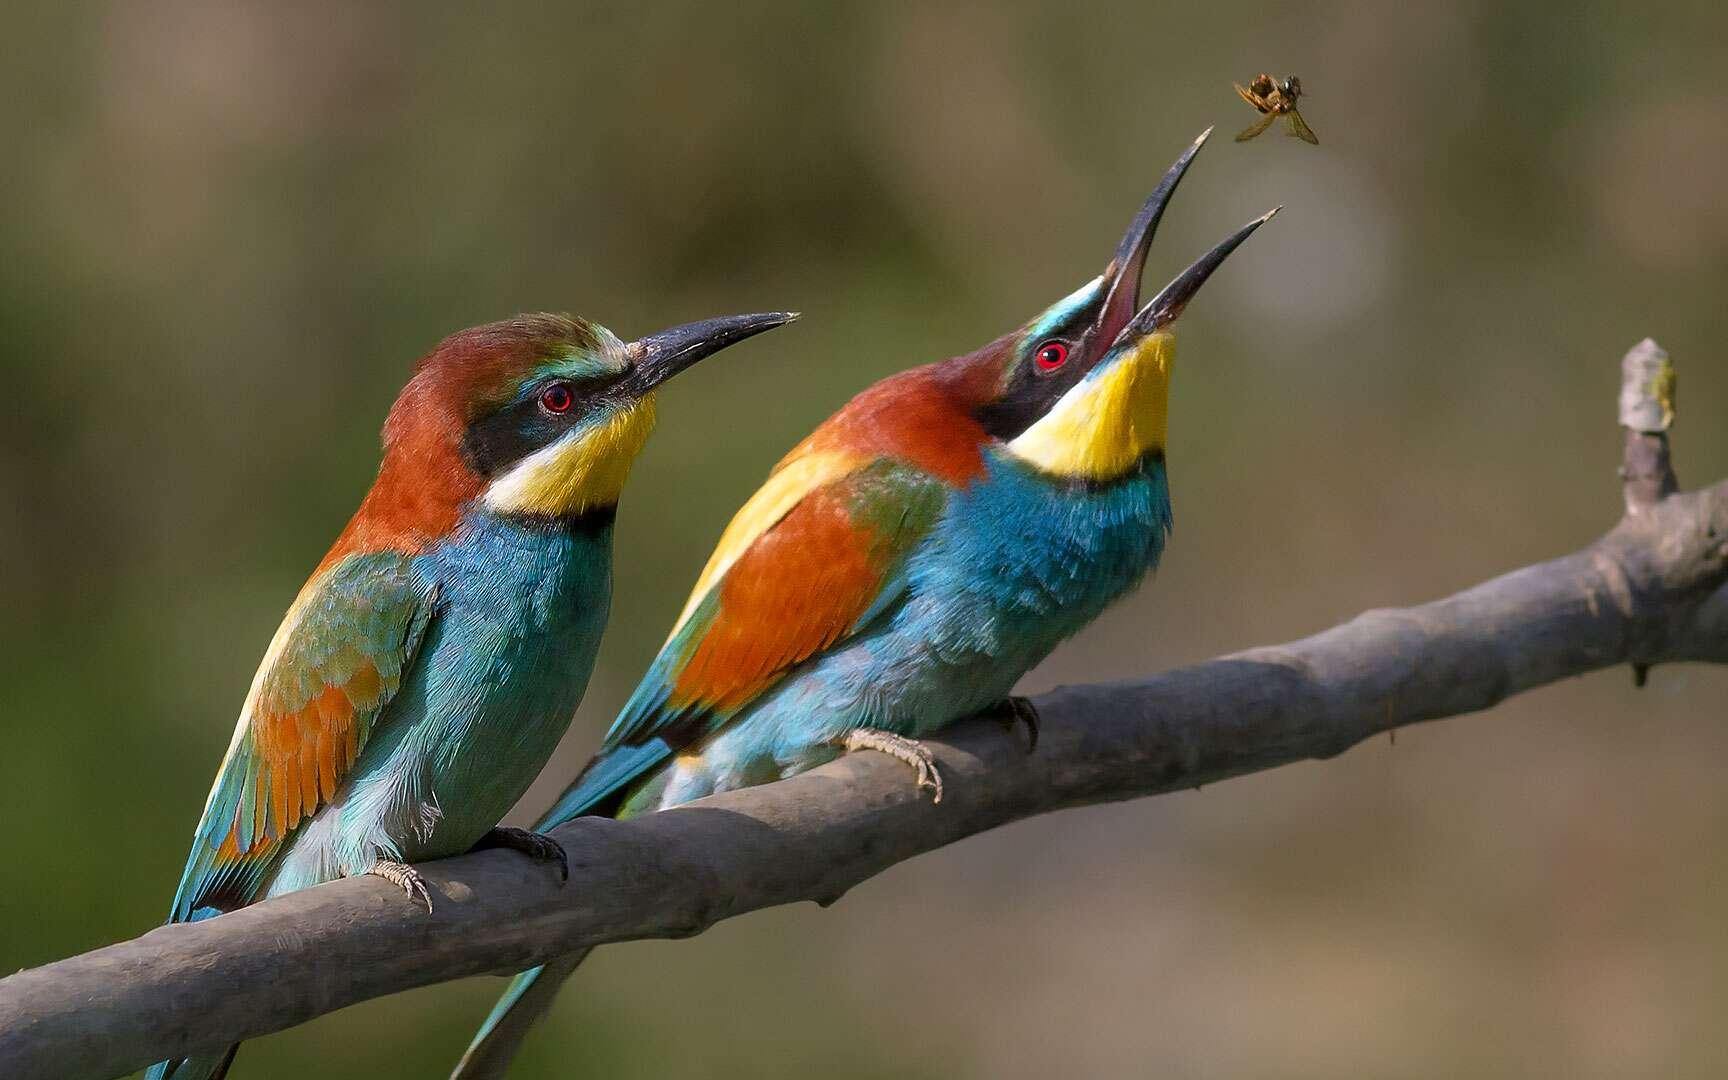 Guêpier d'Europe. Guêpier d'Europe - European Bee-eater - Bienenfresser - Merops apiaster Famille : Meropidae Ordre : Coraciiformes © Pierre Dalous, CC BY-NC 3.0 http://www.eyesonsky.com